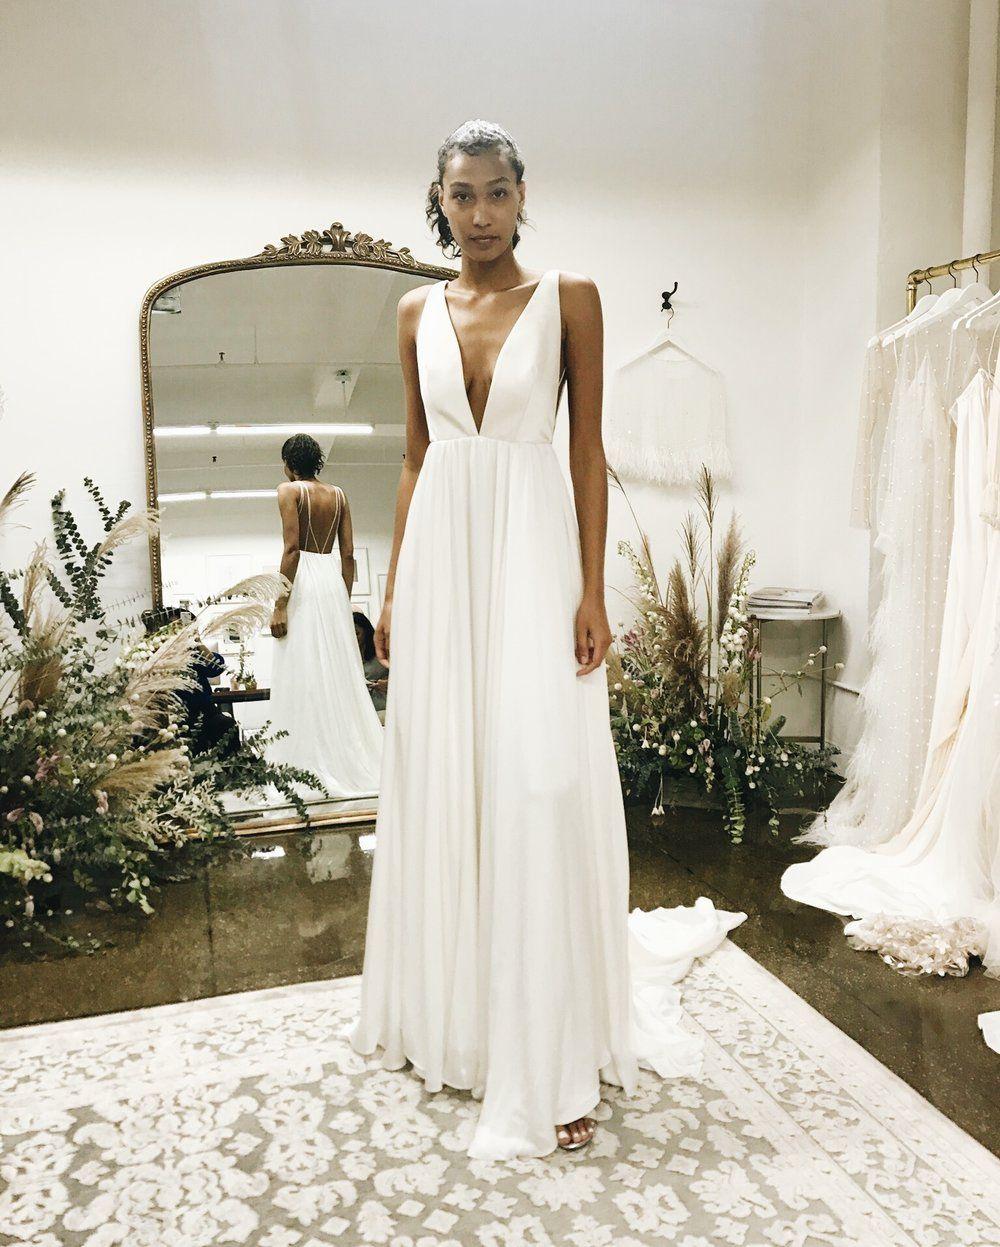 70+ Boho Wedding Dress Designers - Women\'s Dresses for Wedding Guest ...